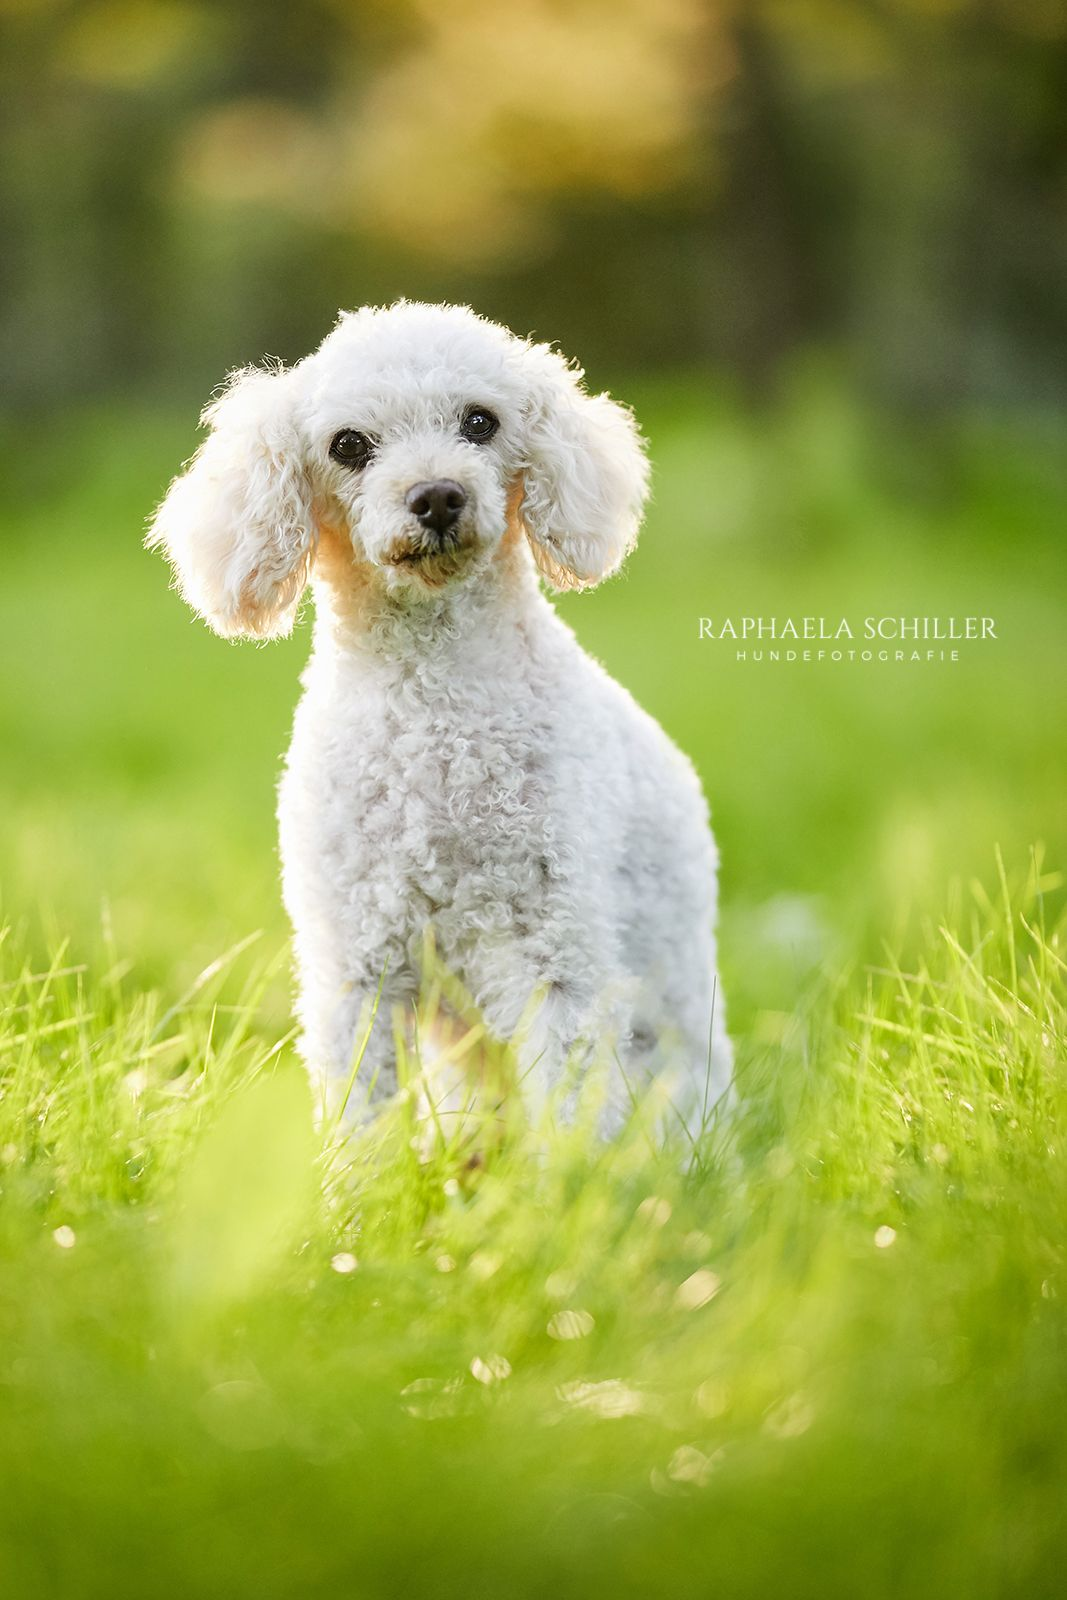 Hundefotografie Dog Photography Hundefotografie Beliebte Hunderassen Hunde